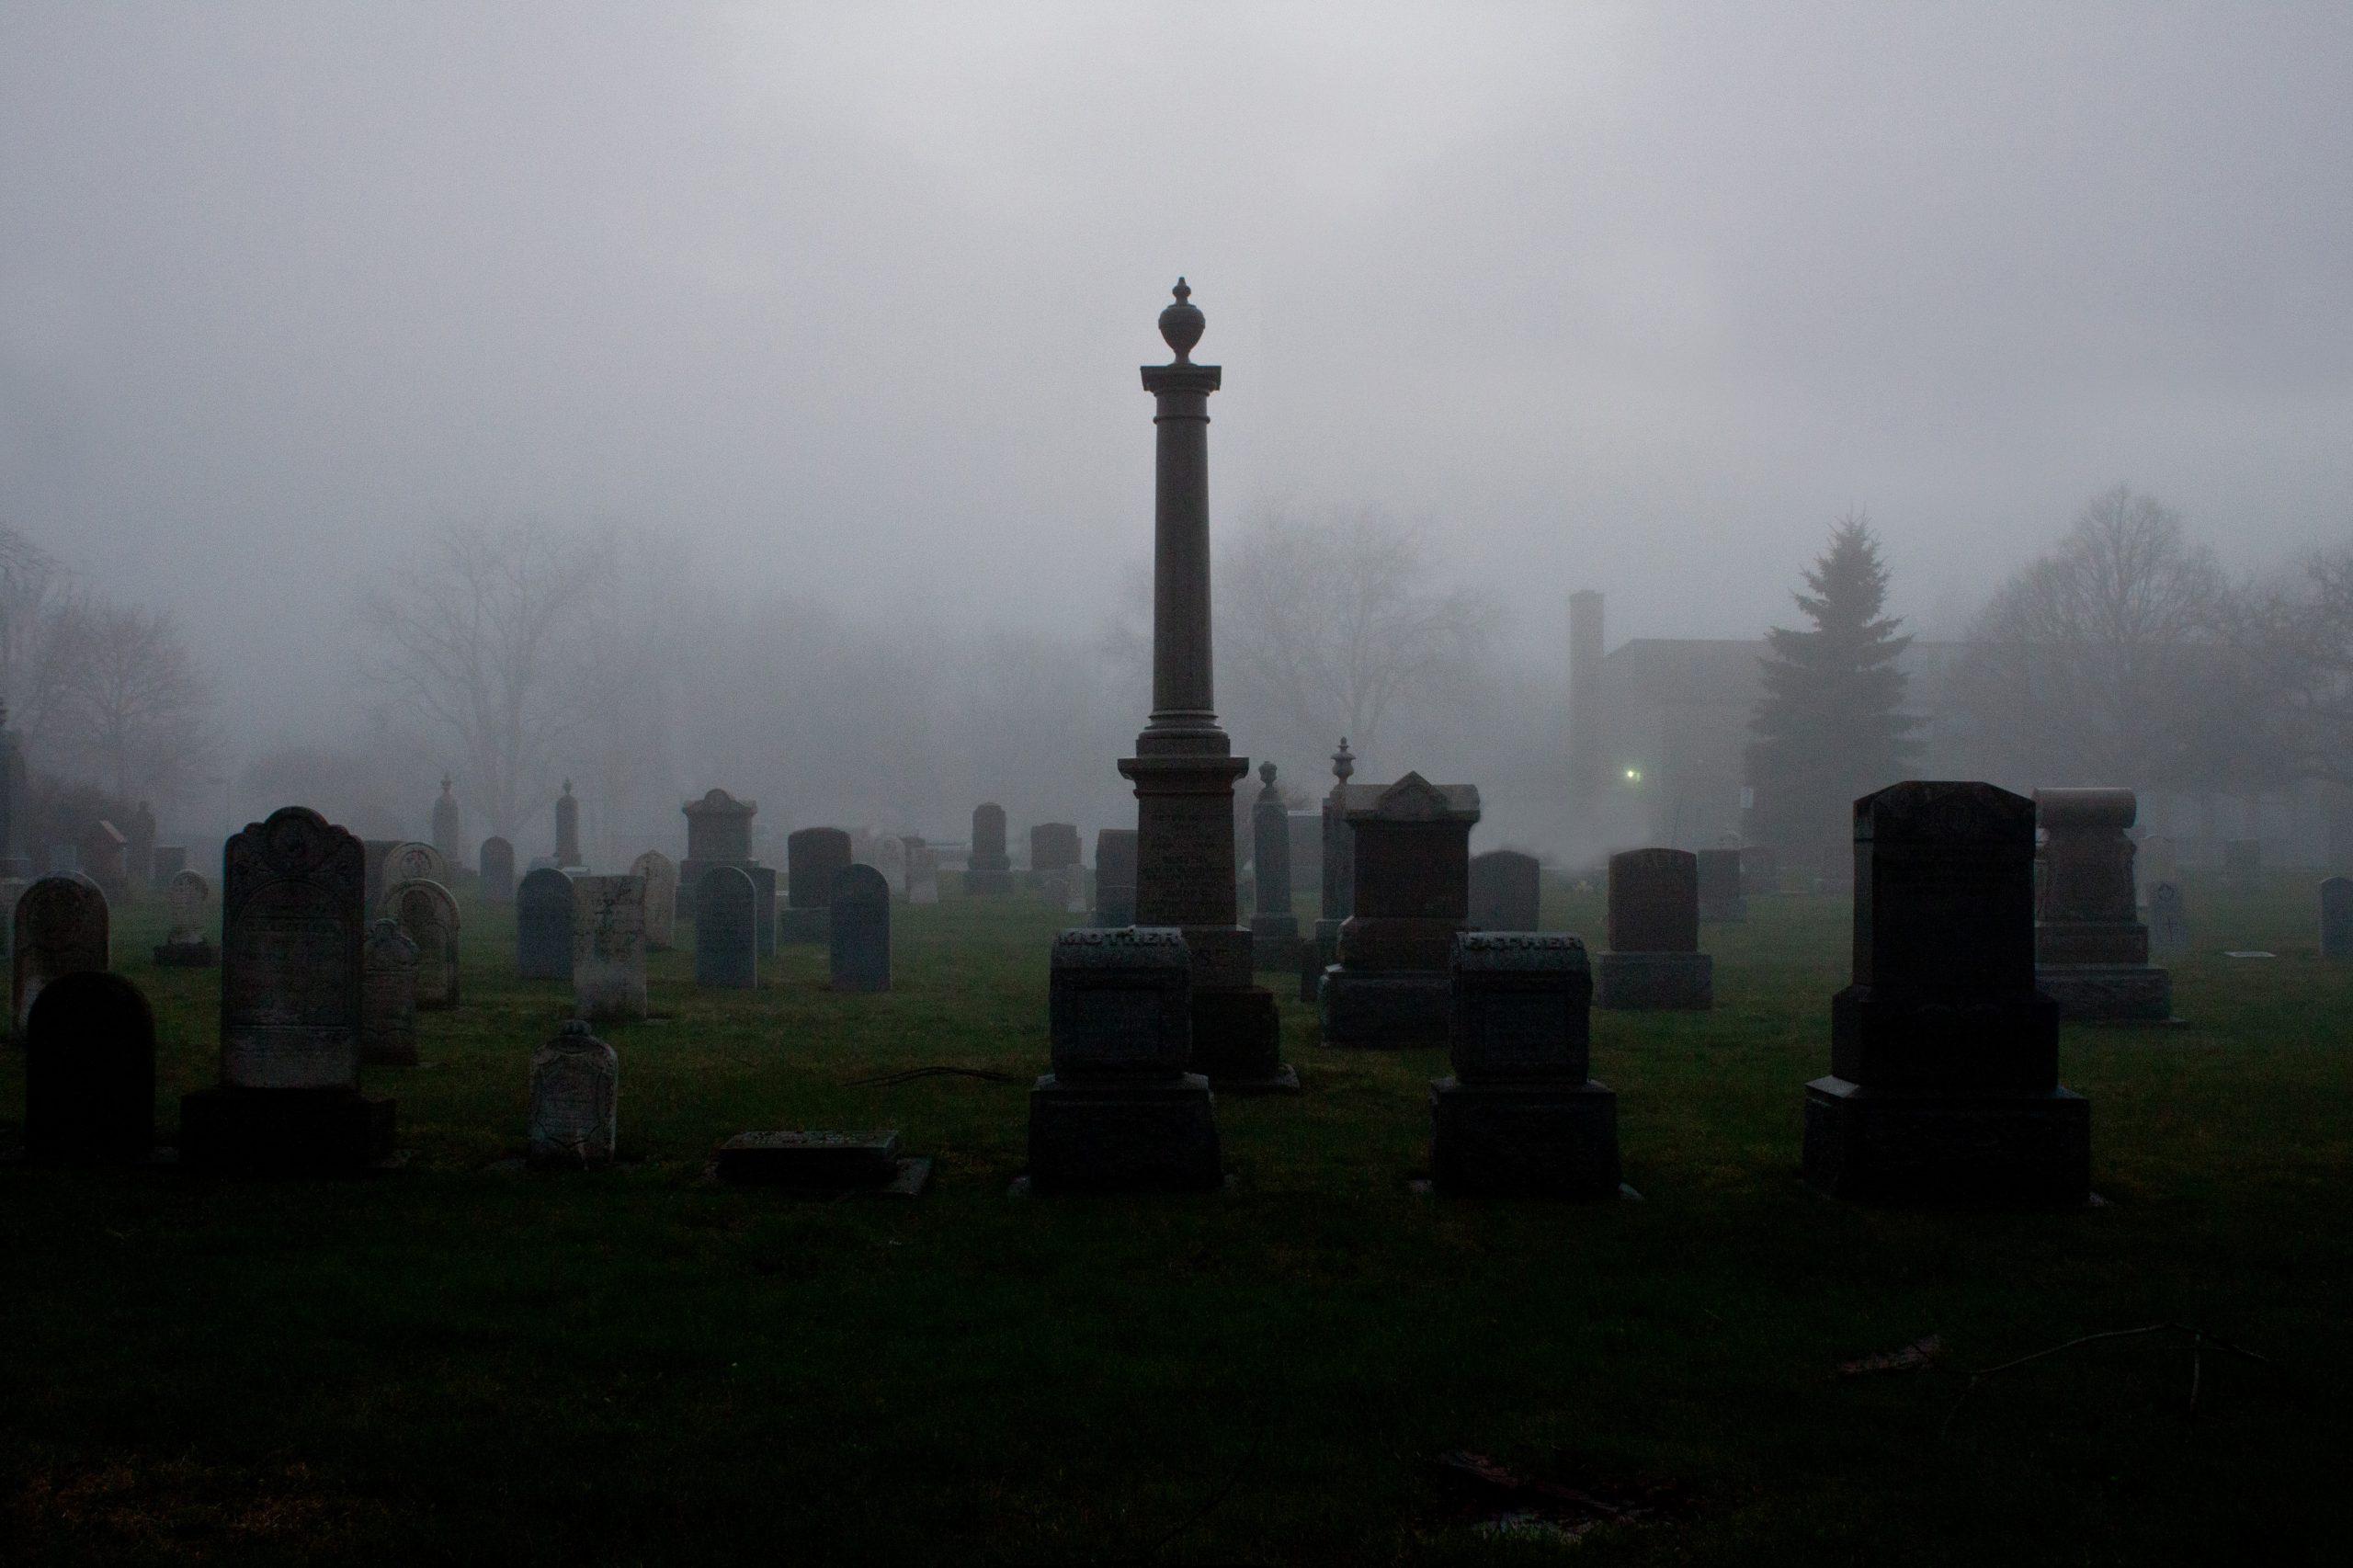 The death positive movement